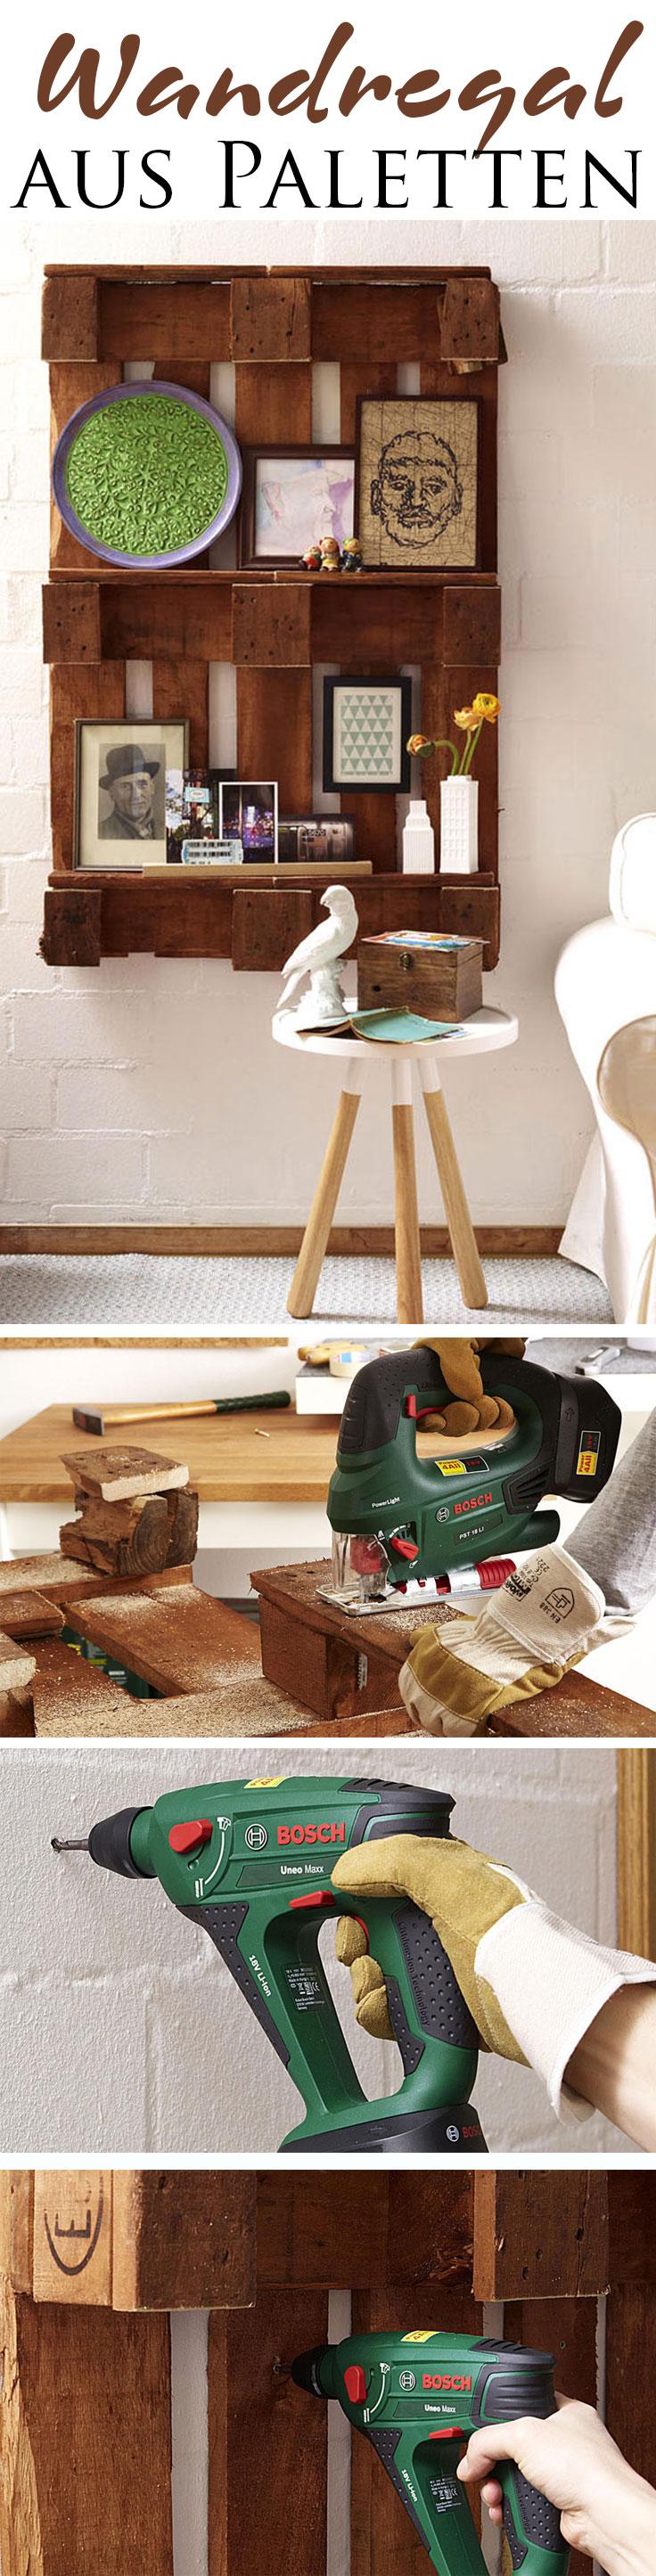 paletten wandregal pinterest selbst bauen wandregal und europalette. Black Bedroom Furniture Sets. Home Design Ideas